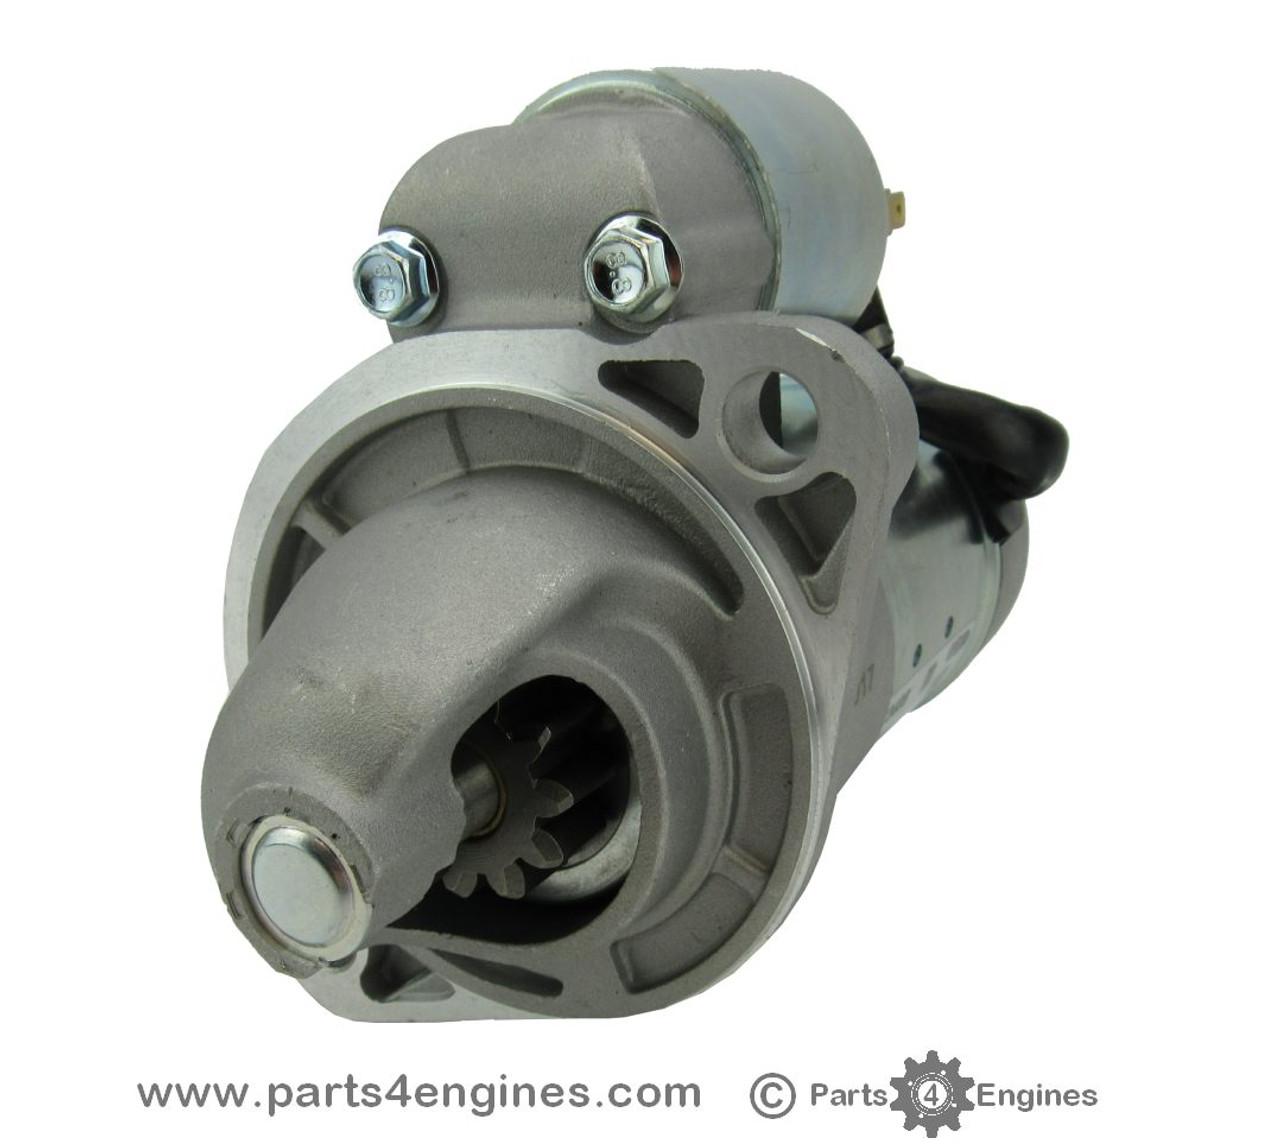 Yanmar 2YM15  Starter Motor - parts4engines.com